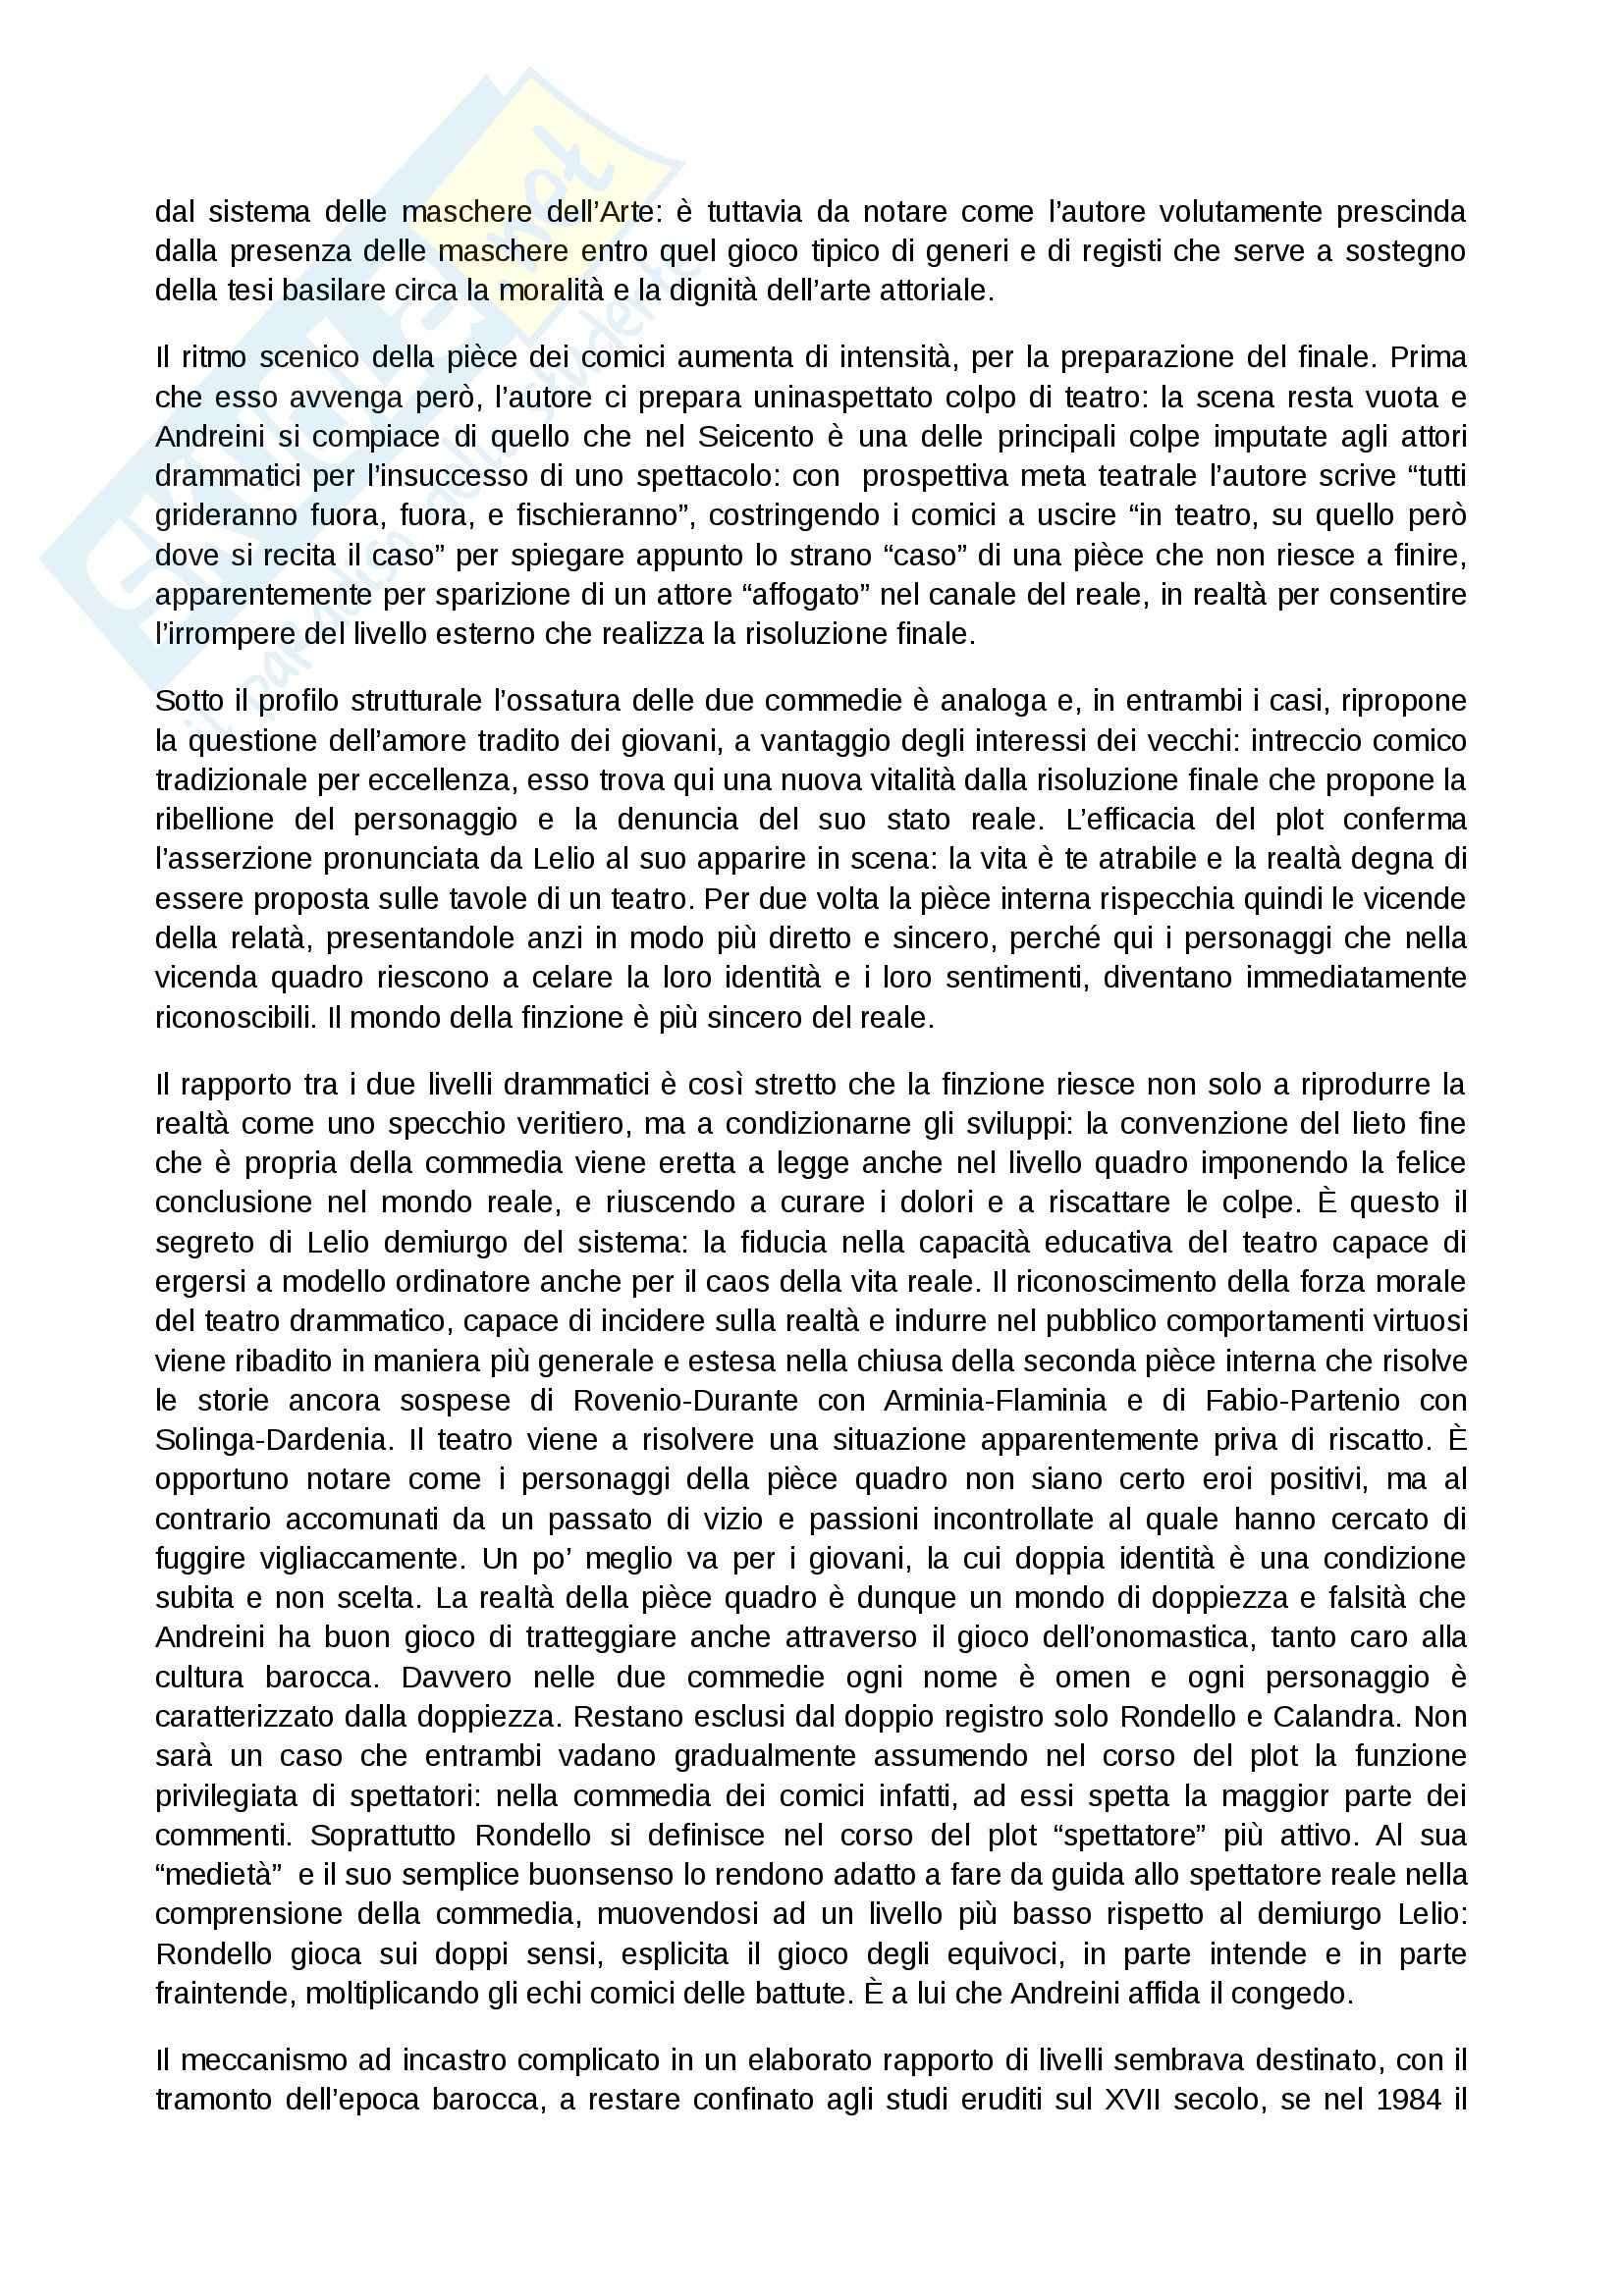 Commedie in commedia: Appunti di Drammaturgia Pag. 6